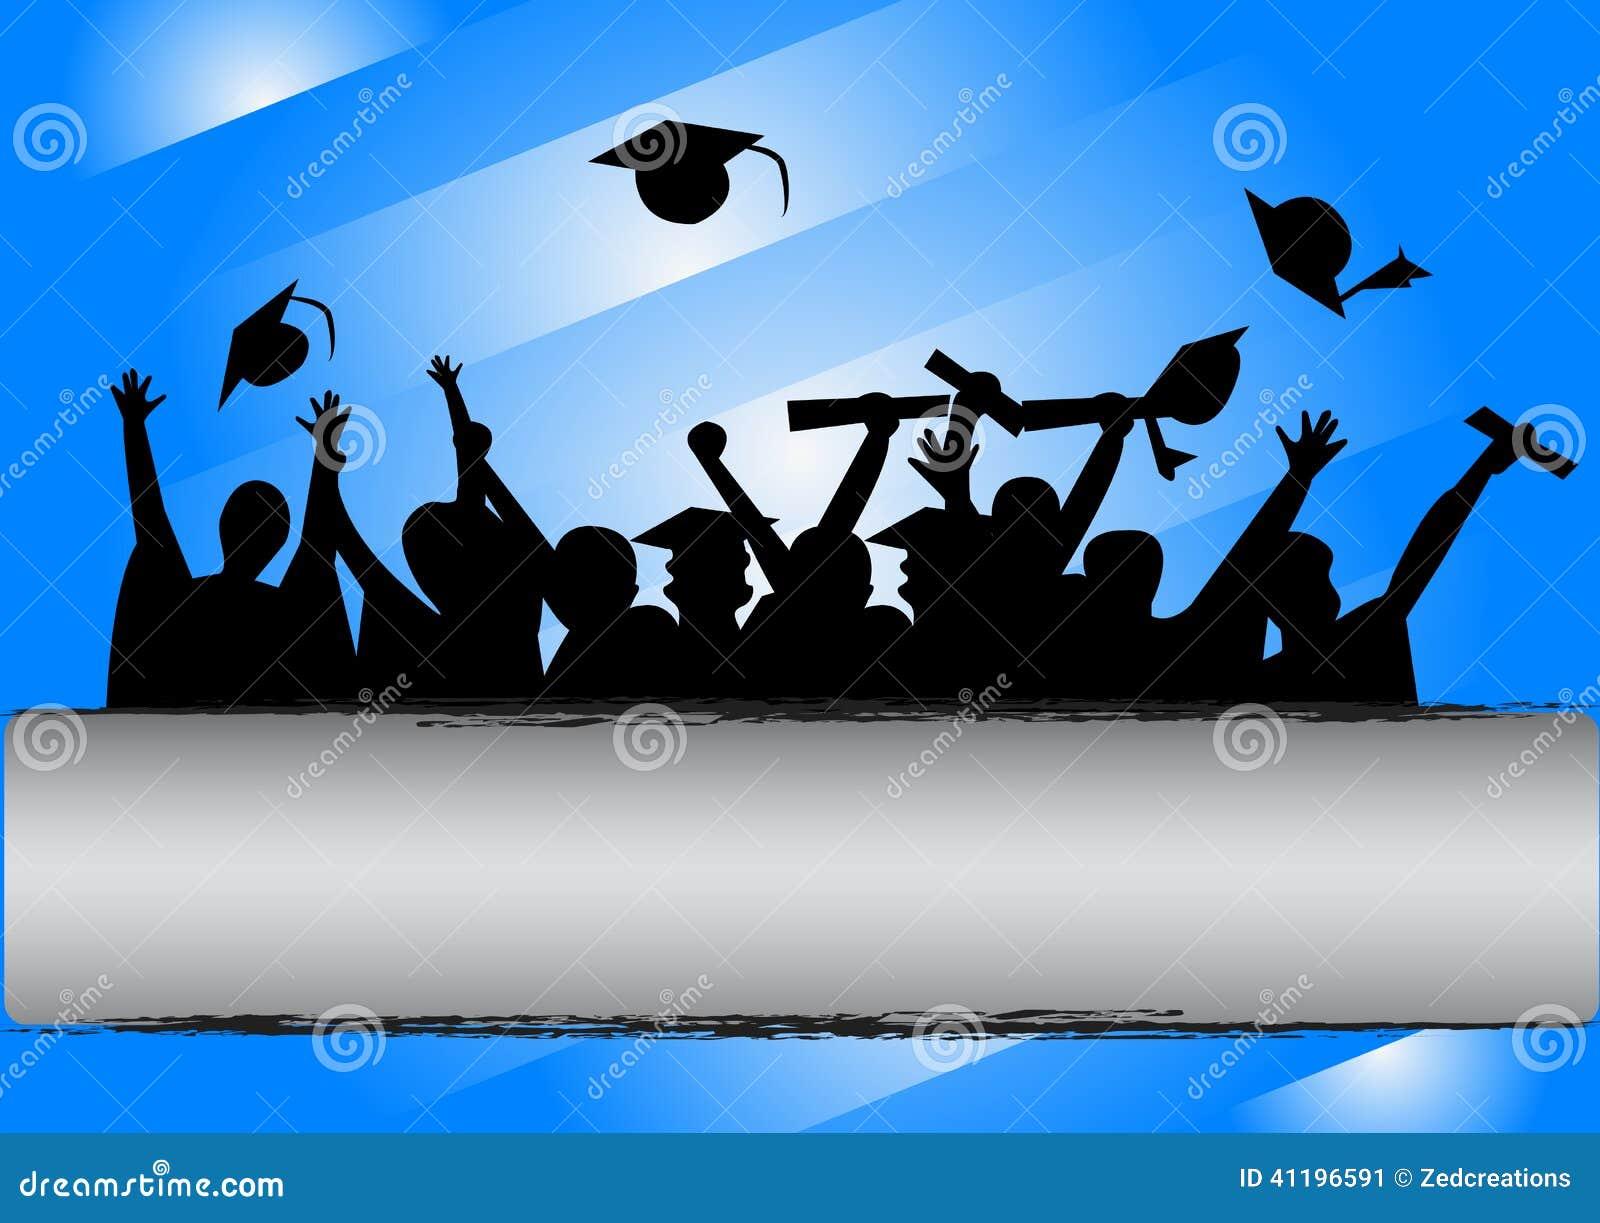 Graduation Background Wallpaper Blue